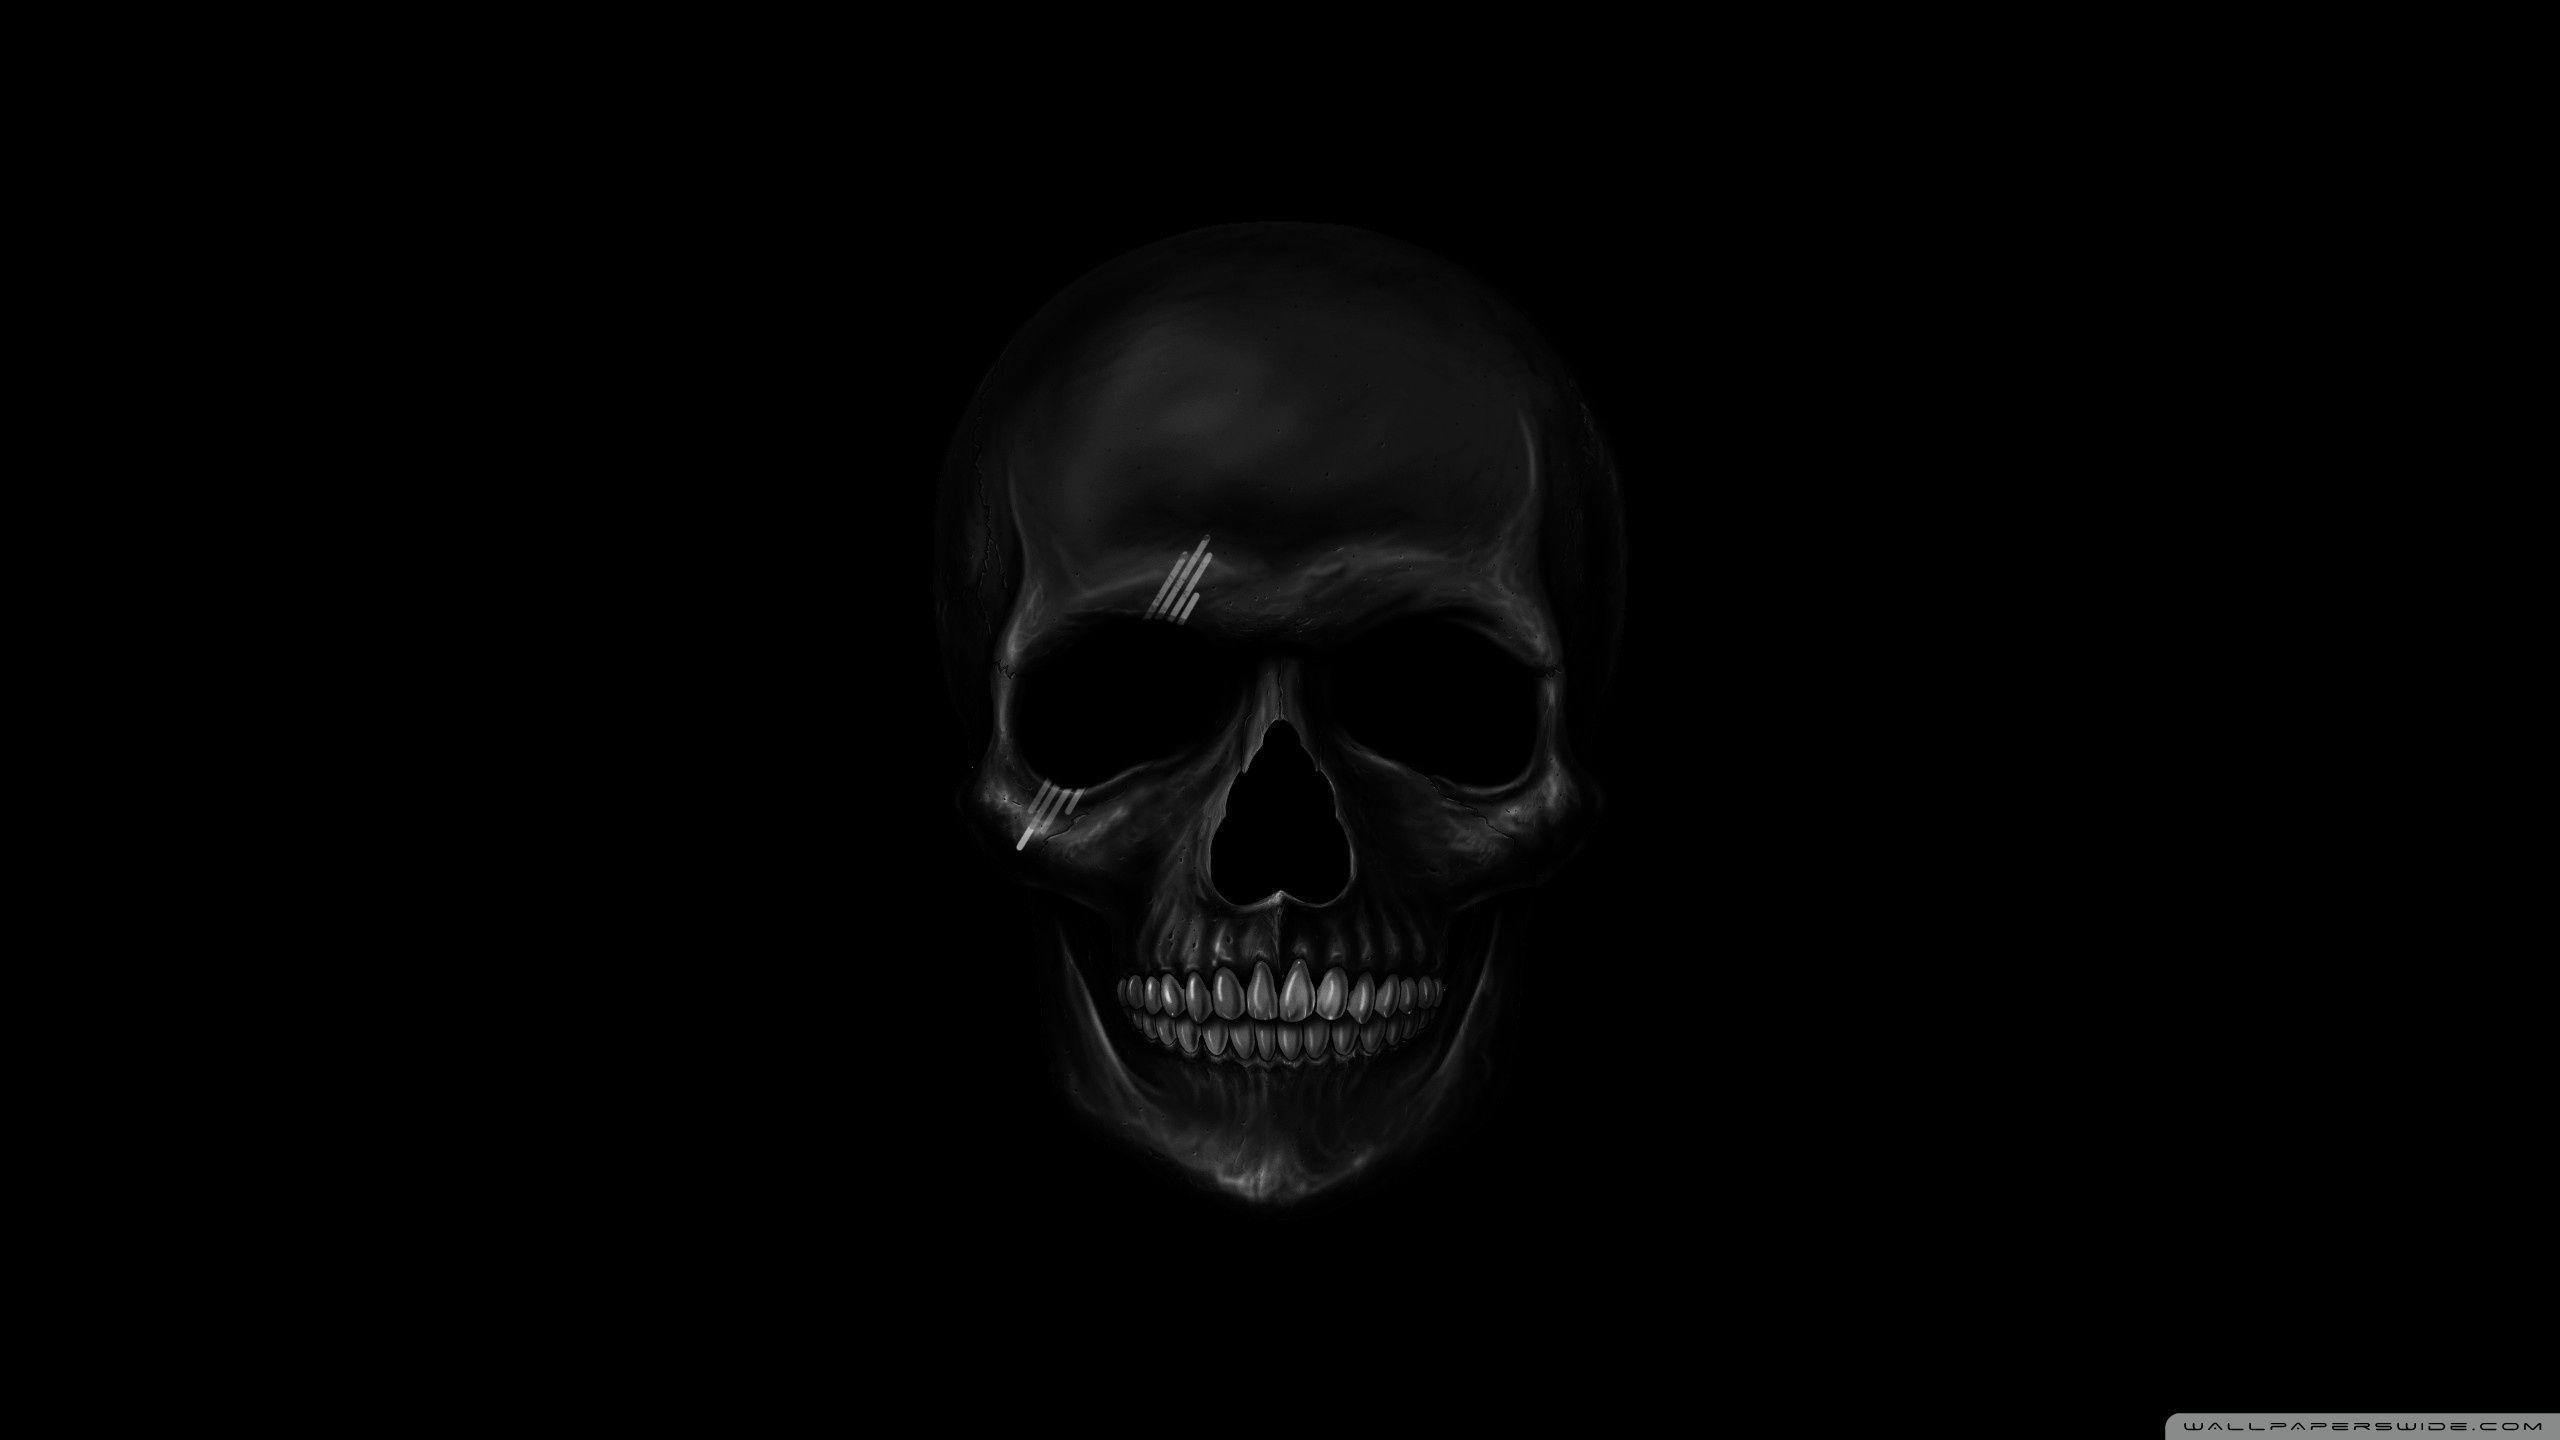 4k Ultra Hd Skull Wallpapers Top Free 4k Ultra Hd Skull